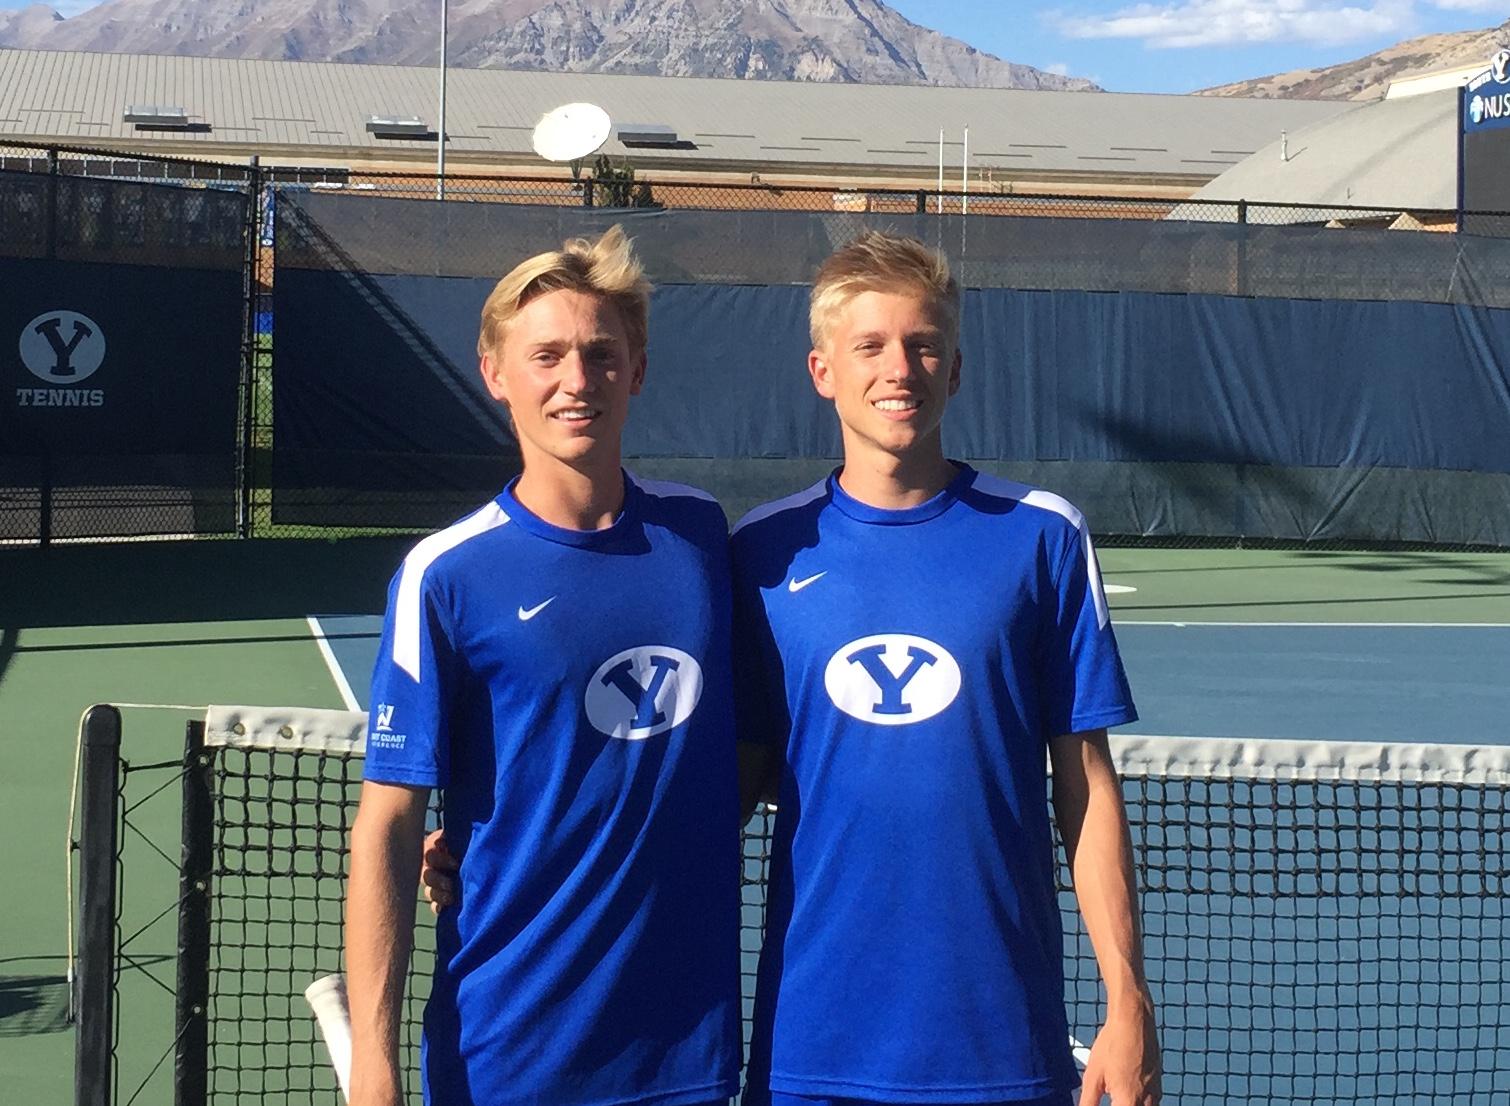 Derek and Garret Vincent joining the tennis team as freshmen together. (Derek Vincent)